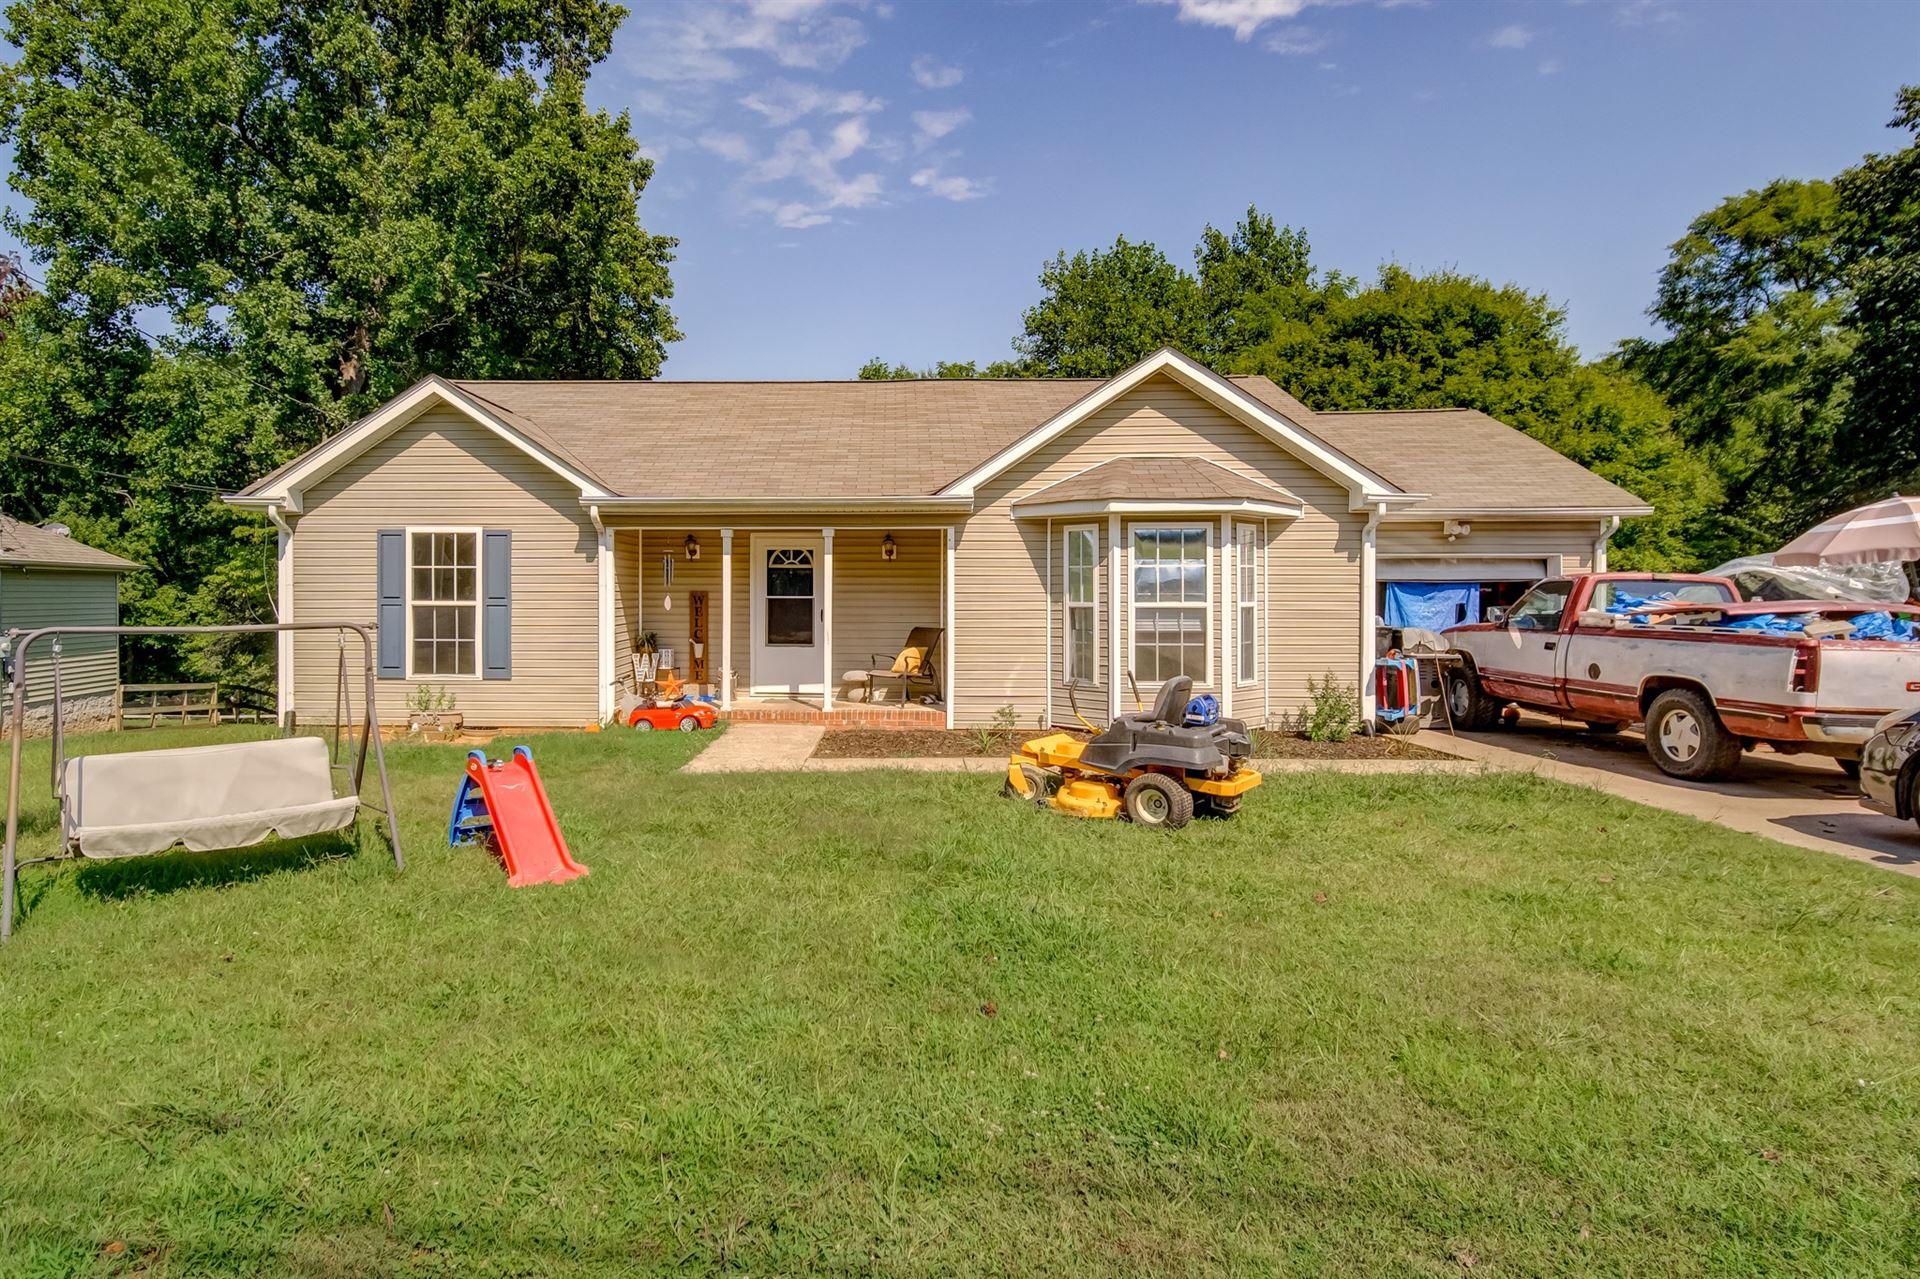 3514 Eastridge Rd, Woodlawn, TN 37191 - MLS#: 2282863